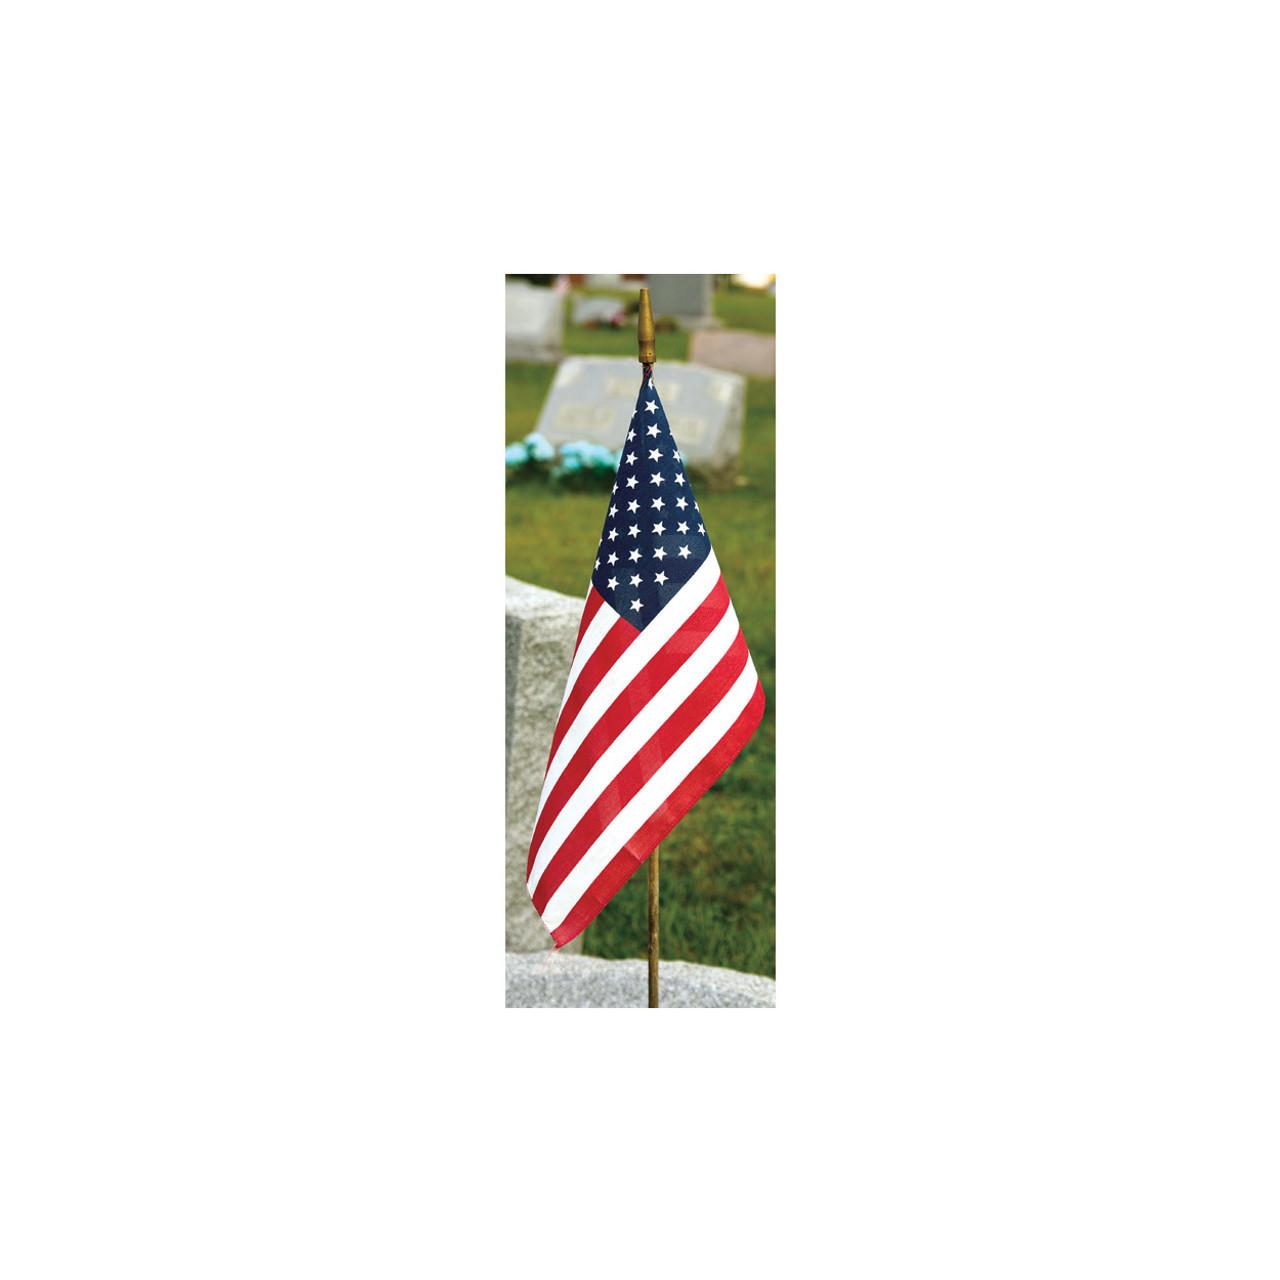 USA Mounted Flags